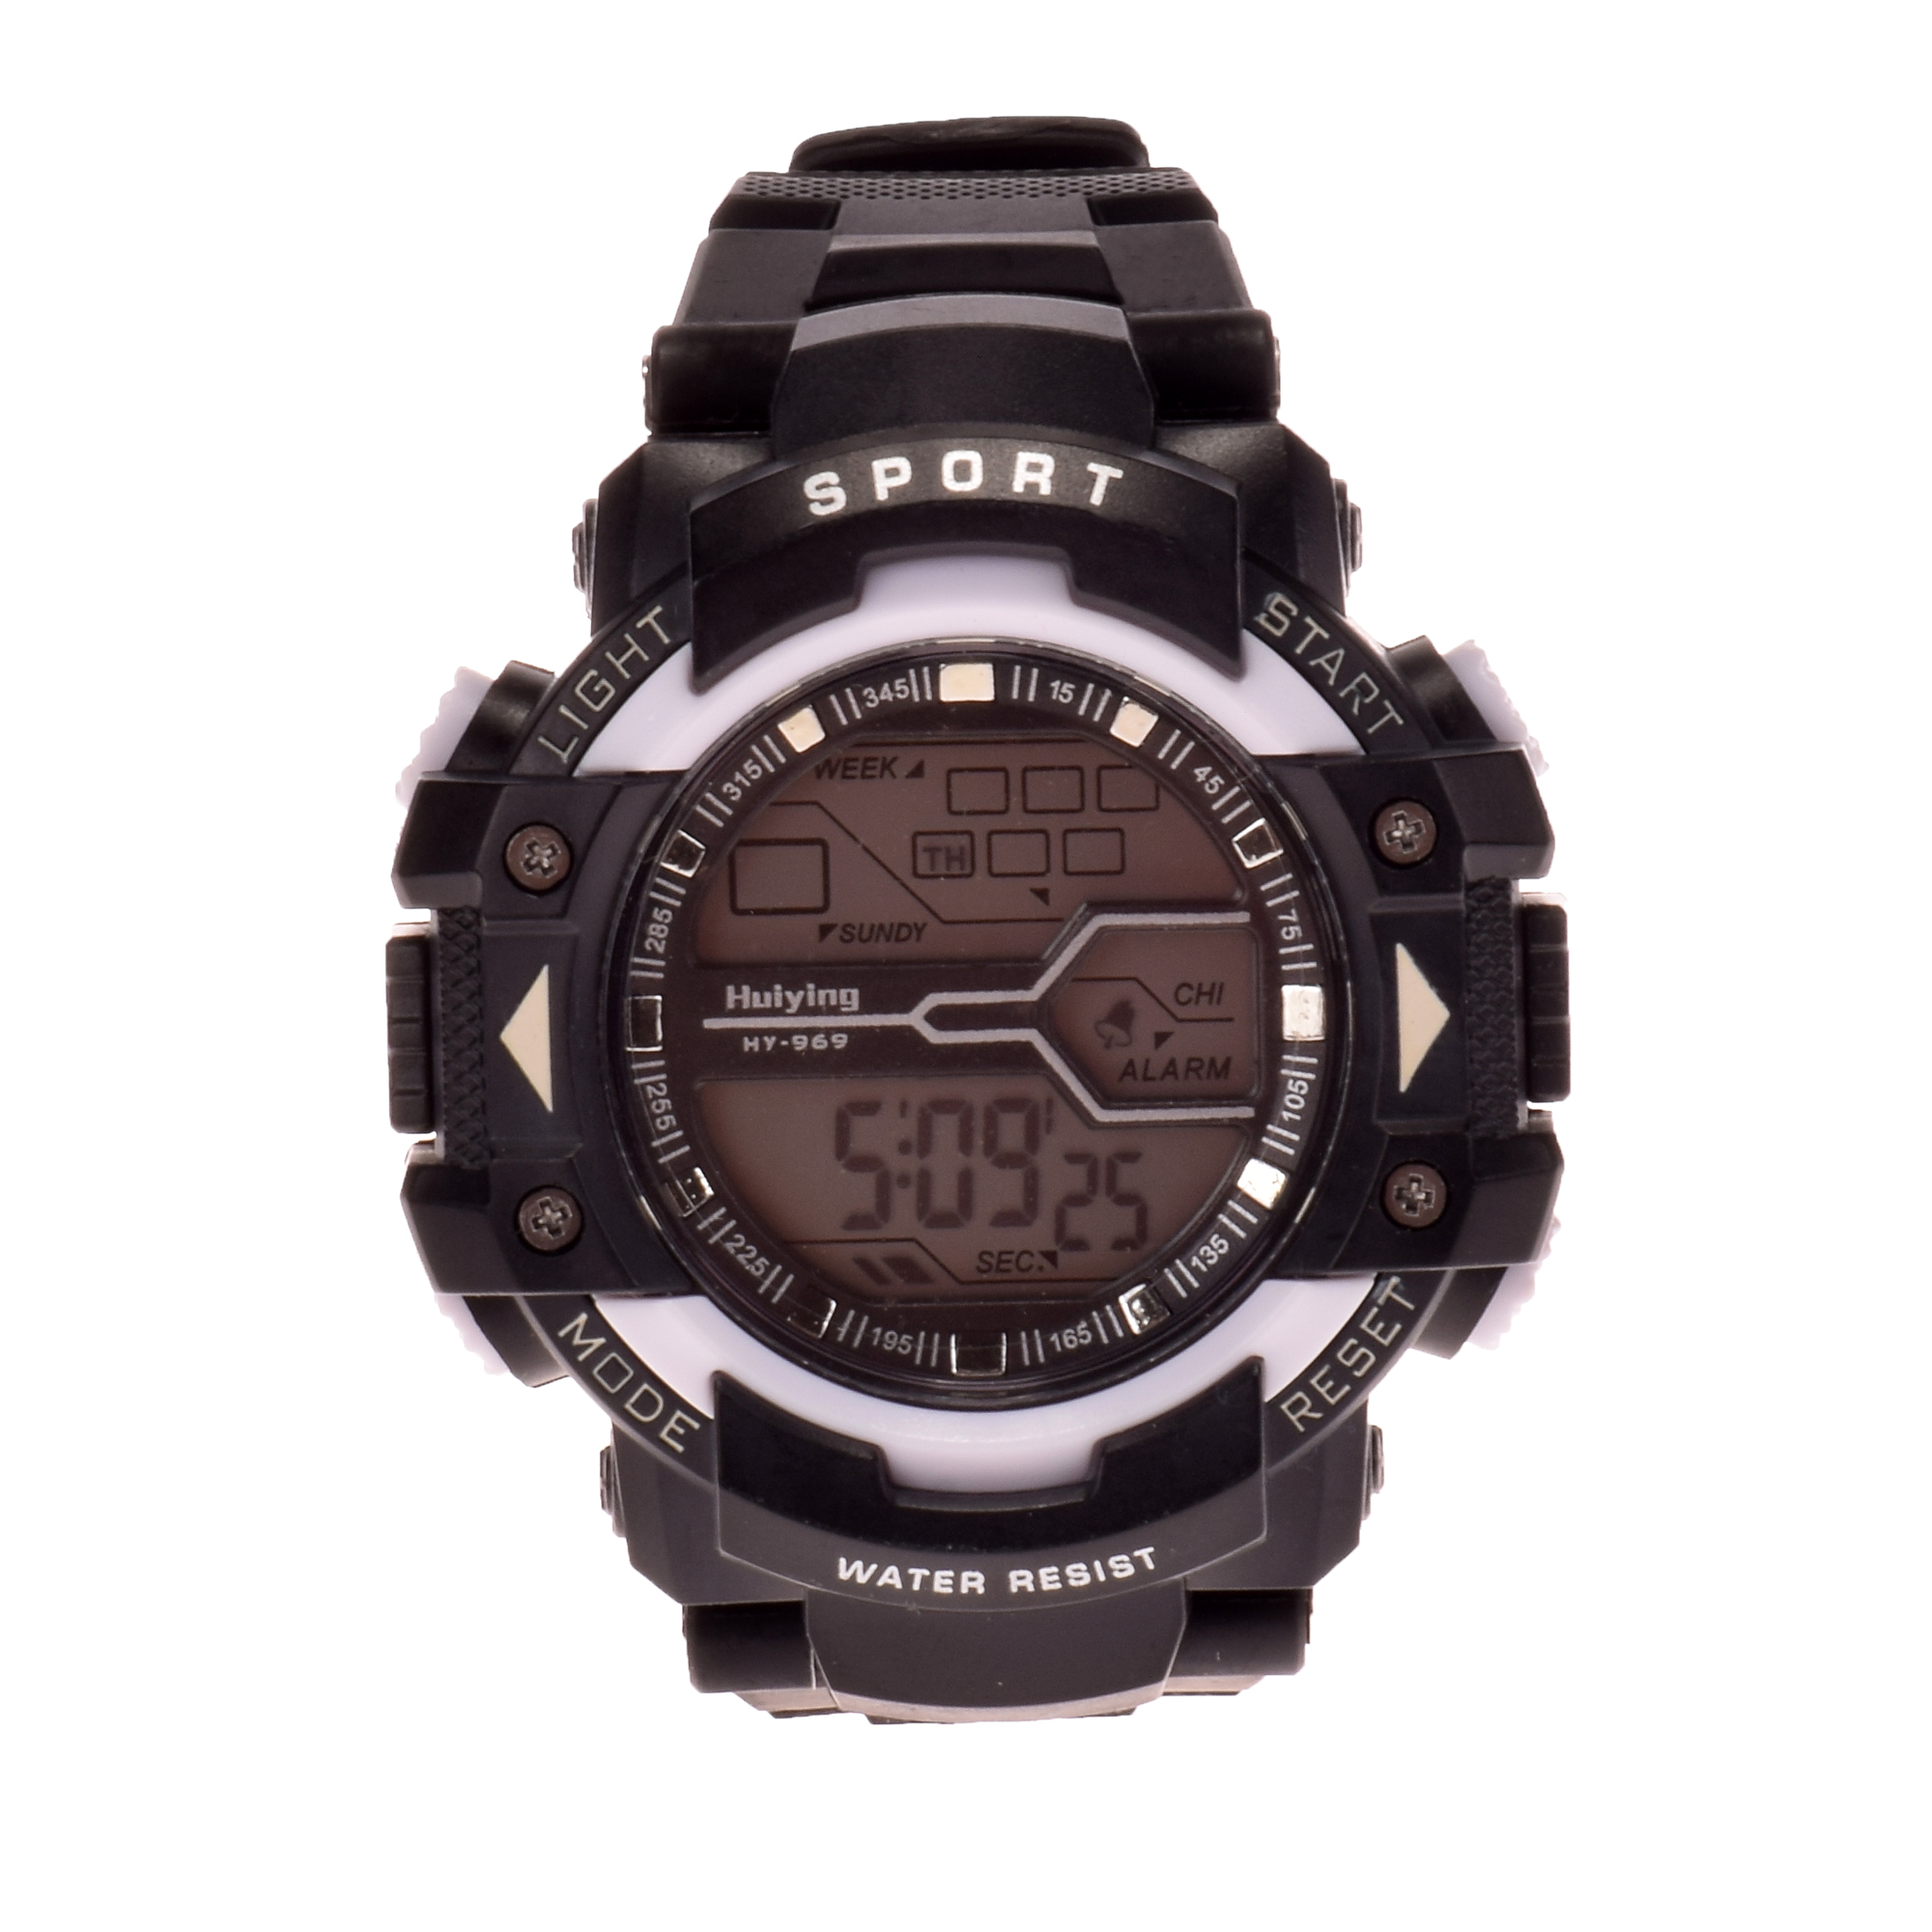 ساعت مچی دیجیتال مردانه هیولینگ مدل hy-969             قیمت